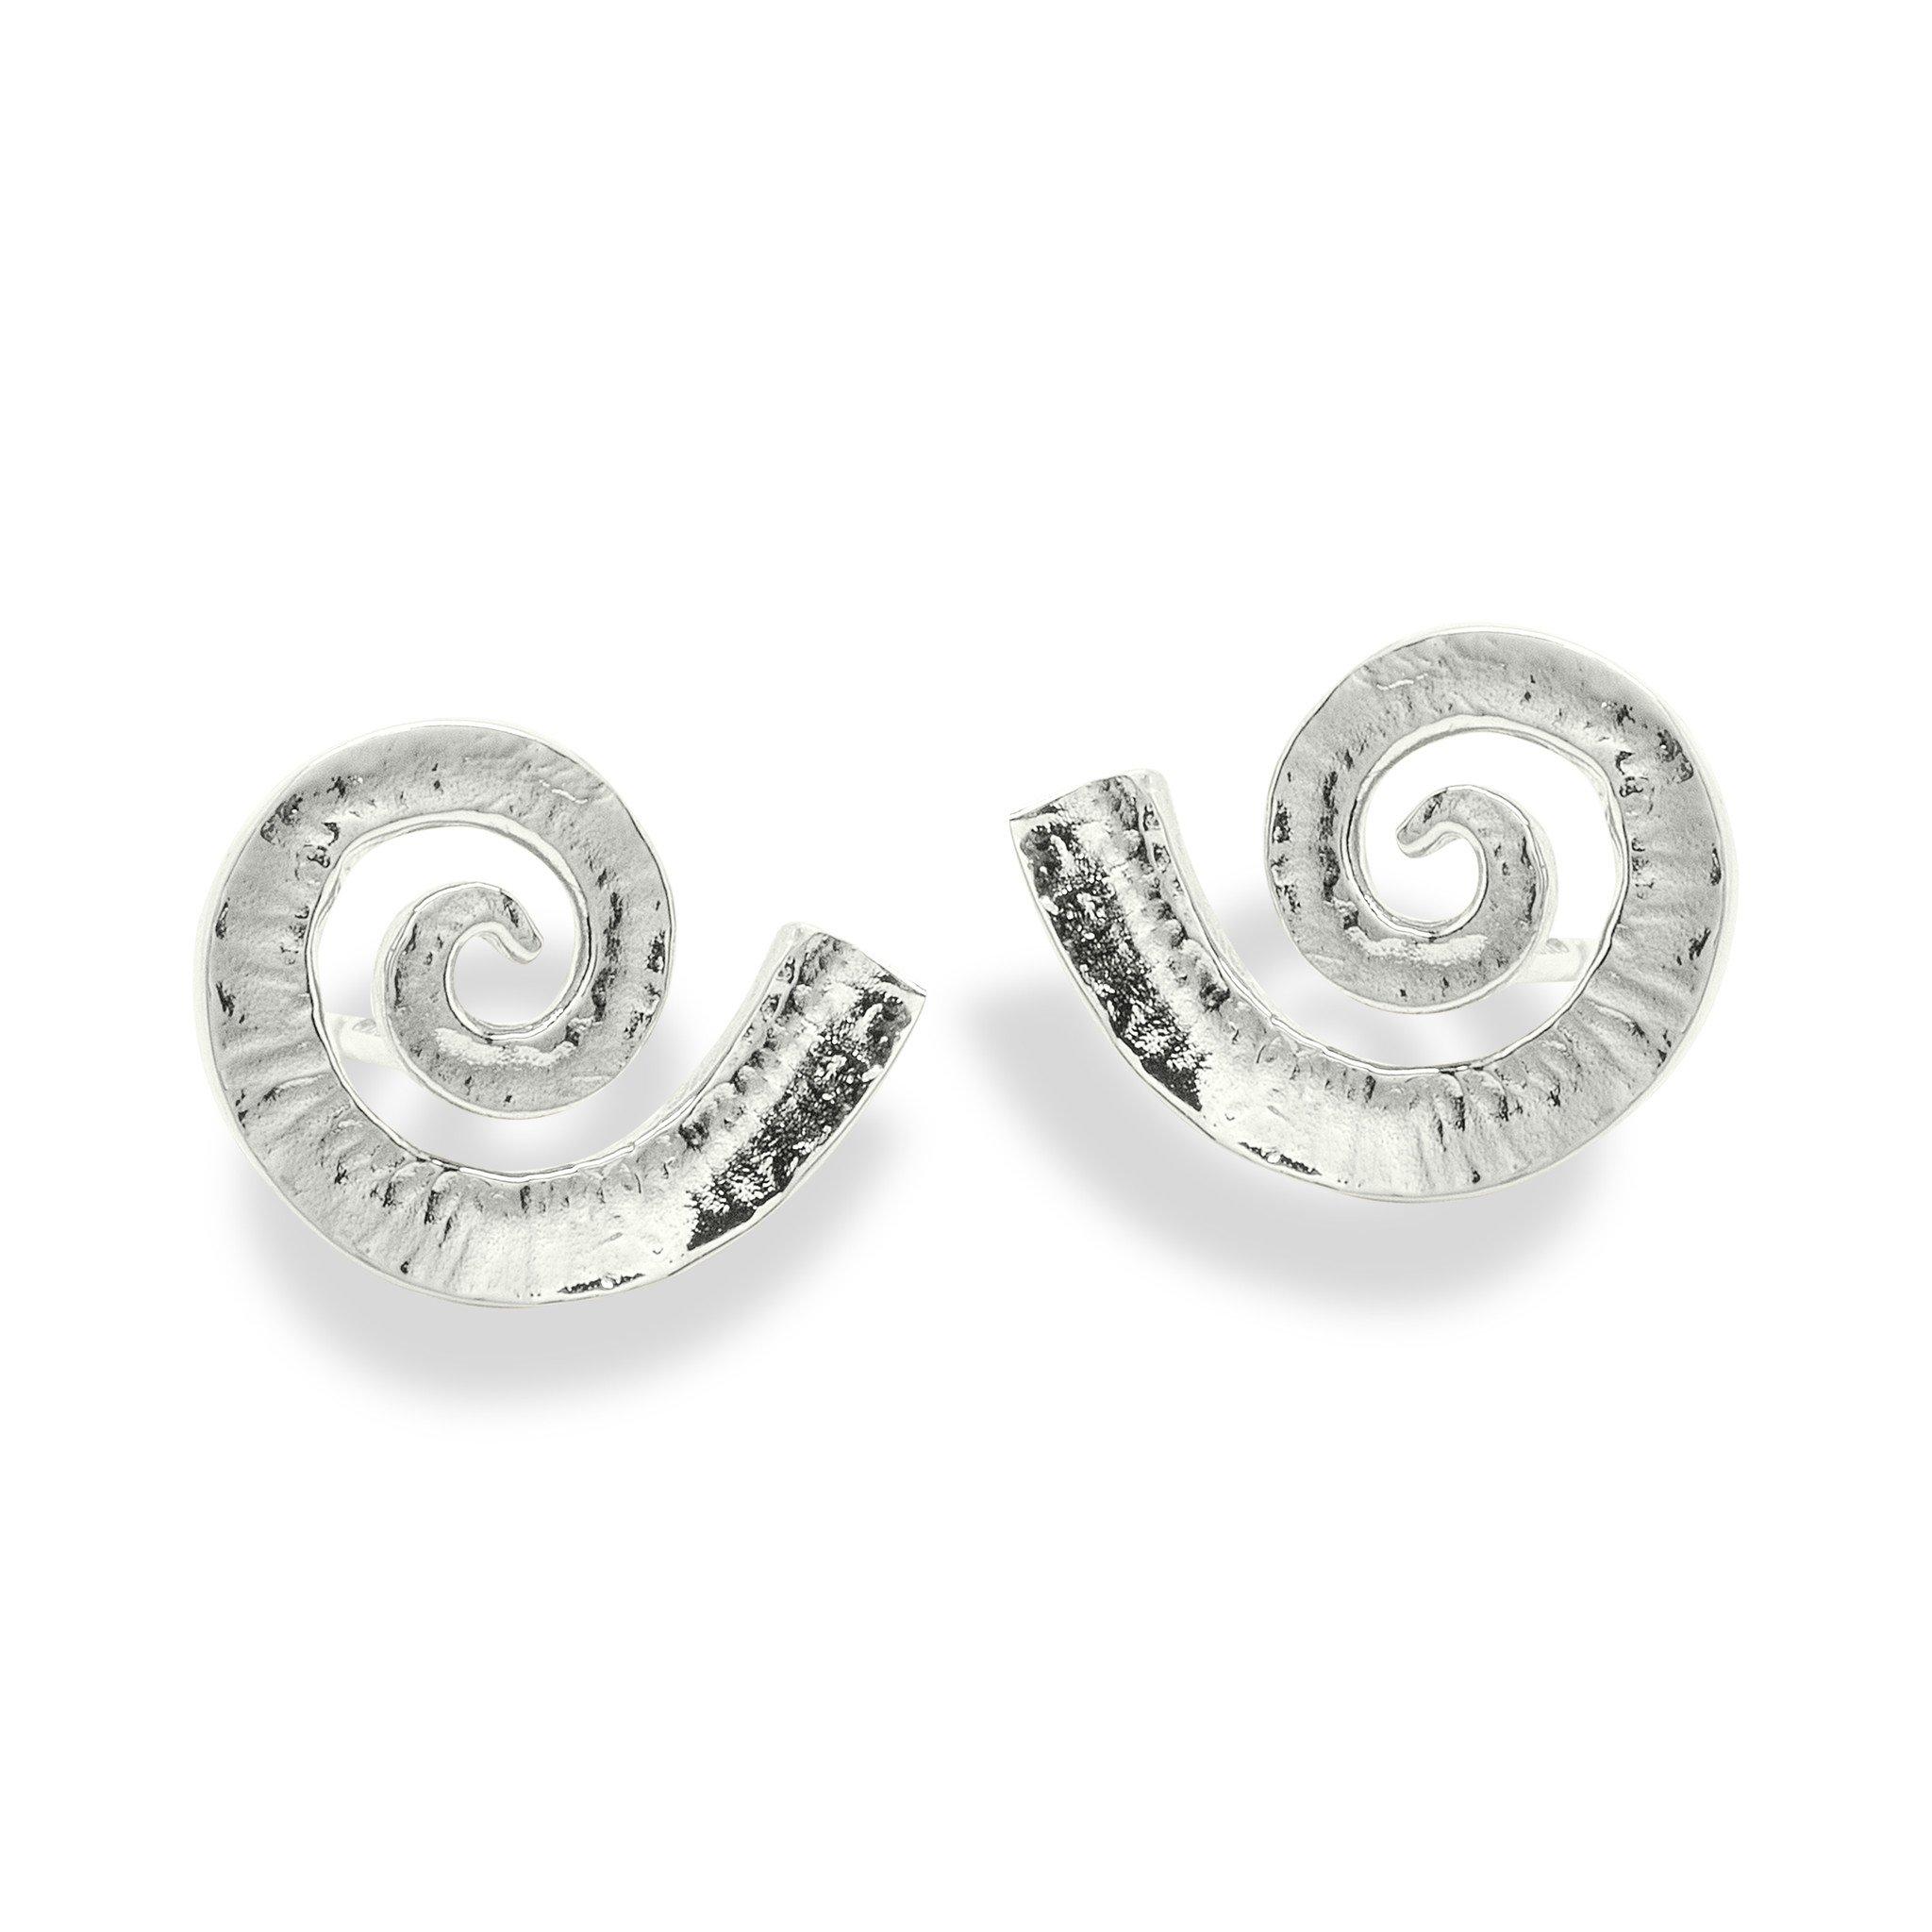 Dreki Medium Spiral Sea Wave Silver Stud